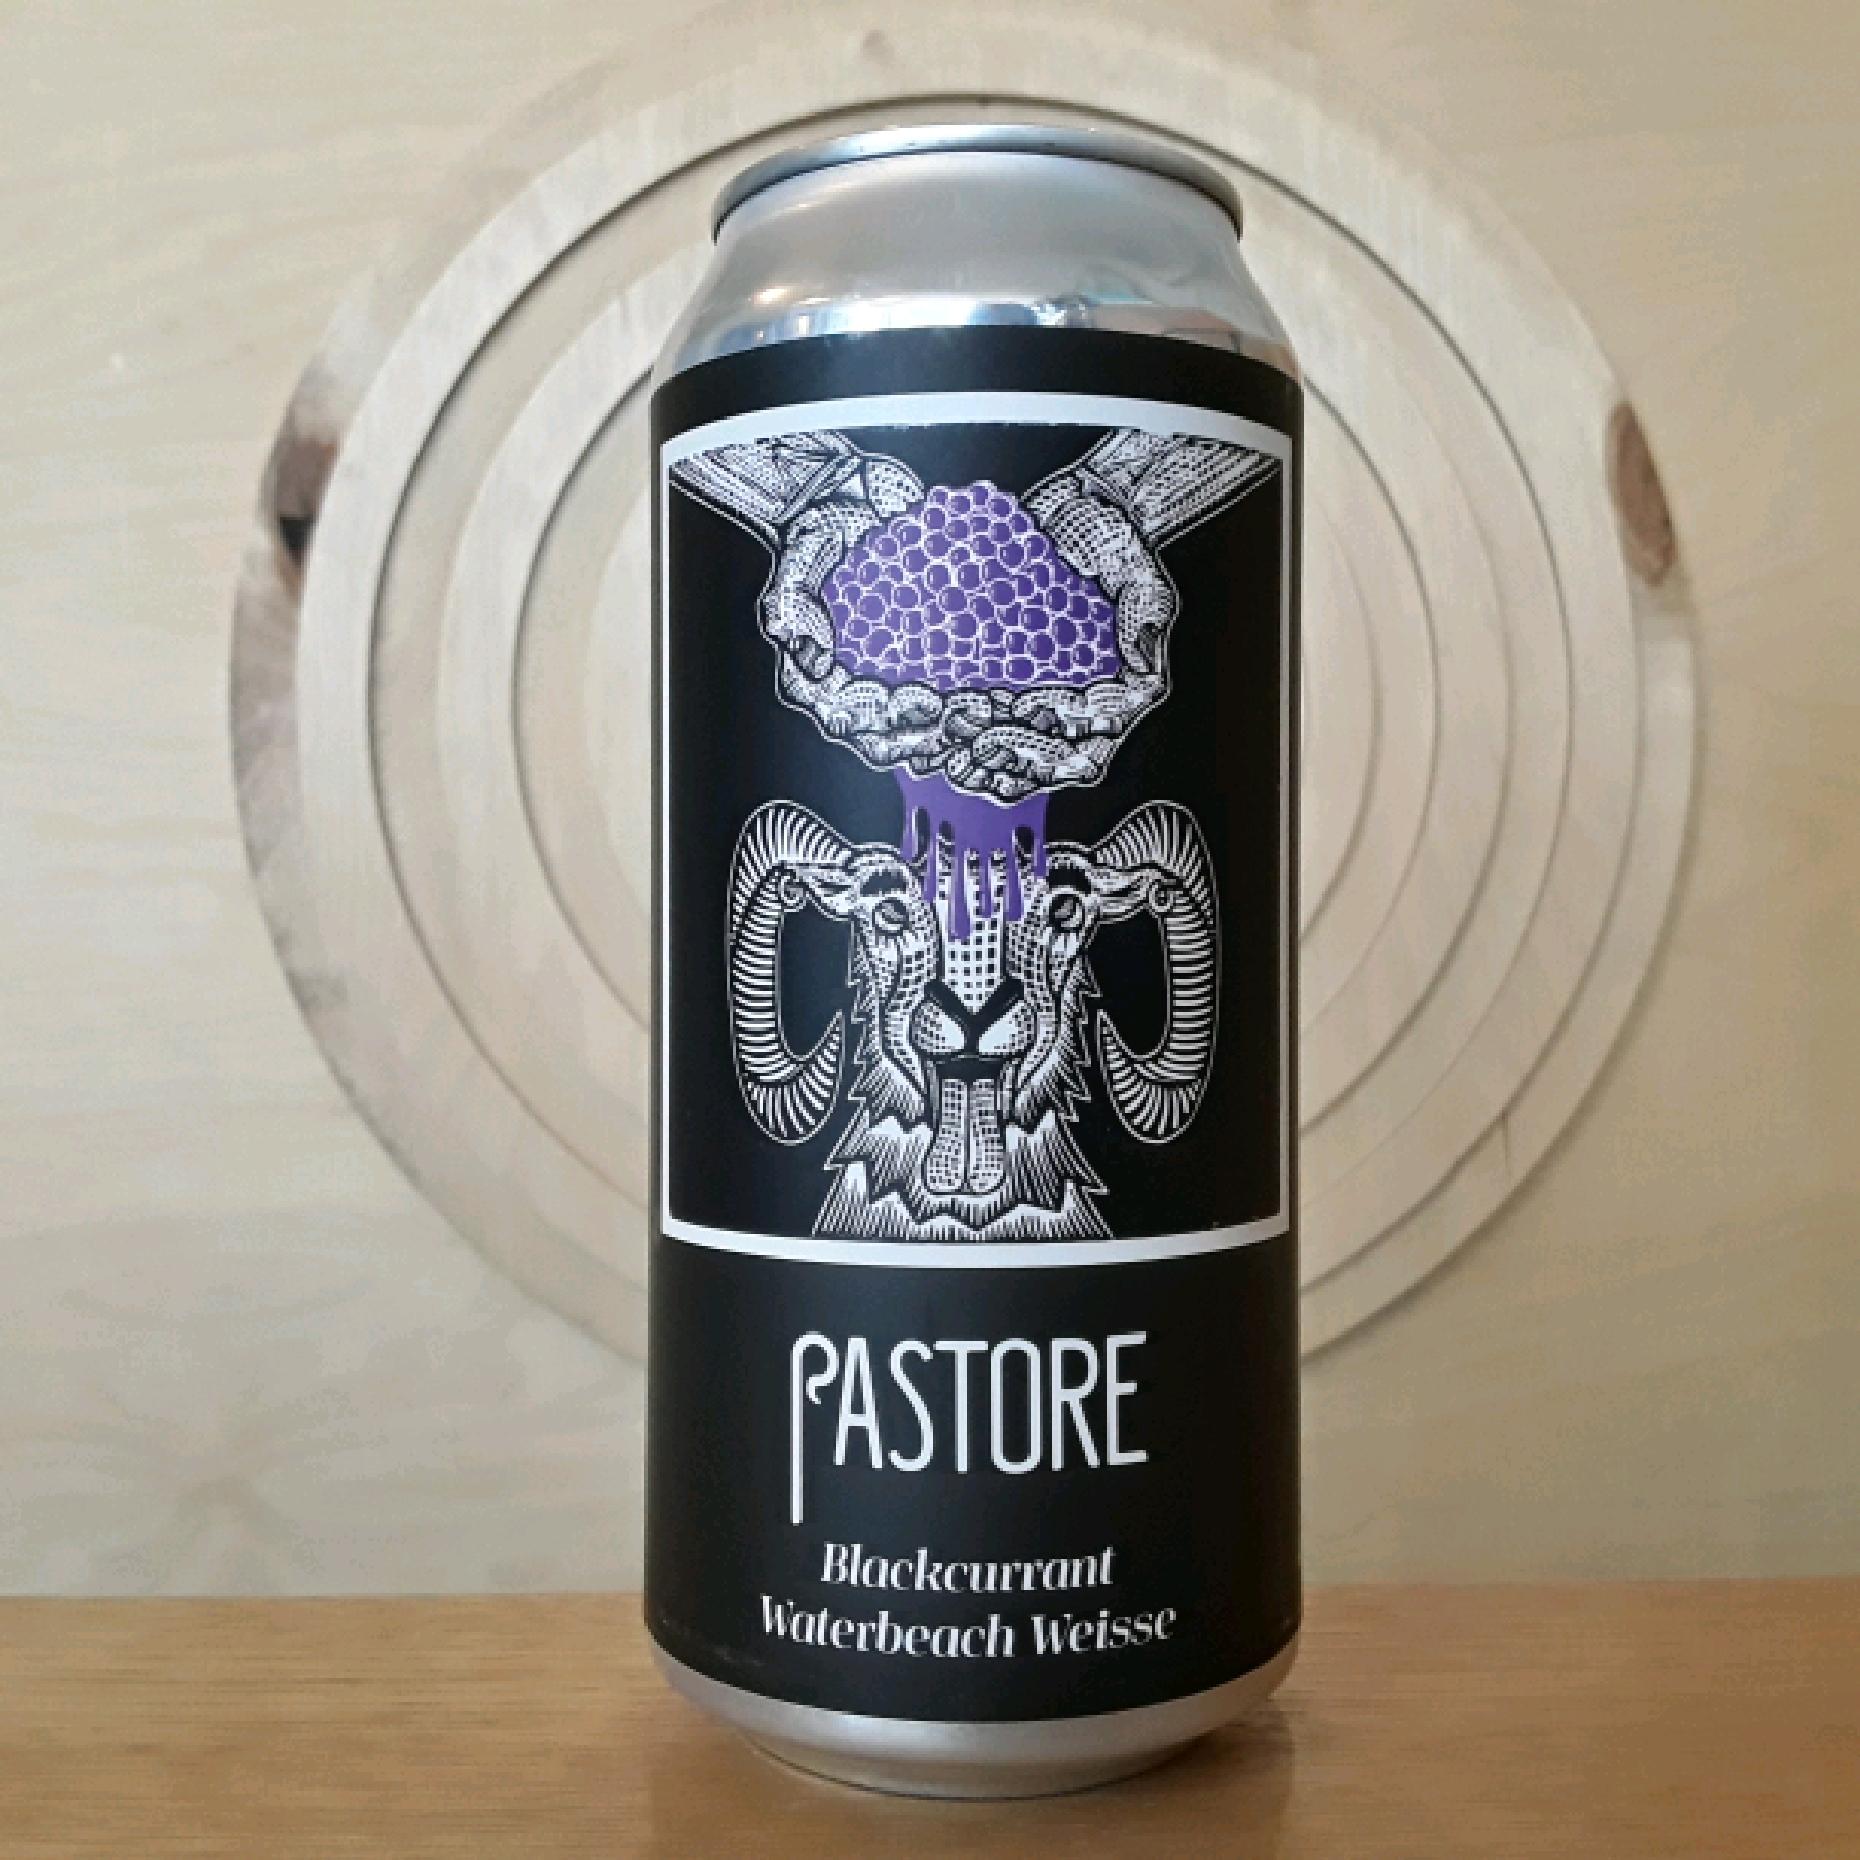 Pastore Brewing and Blending | Waterbeach Weisse Blackcurrant | Sour - Fruited Berliner Weisse